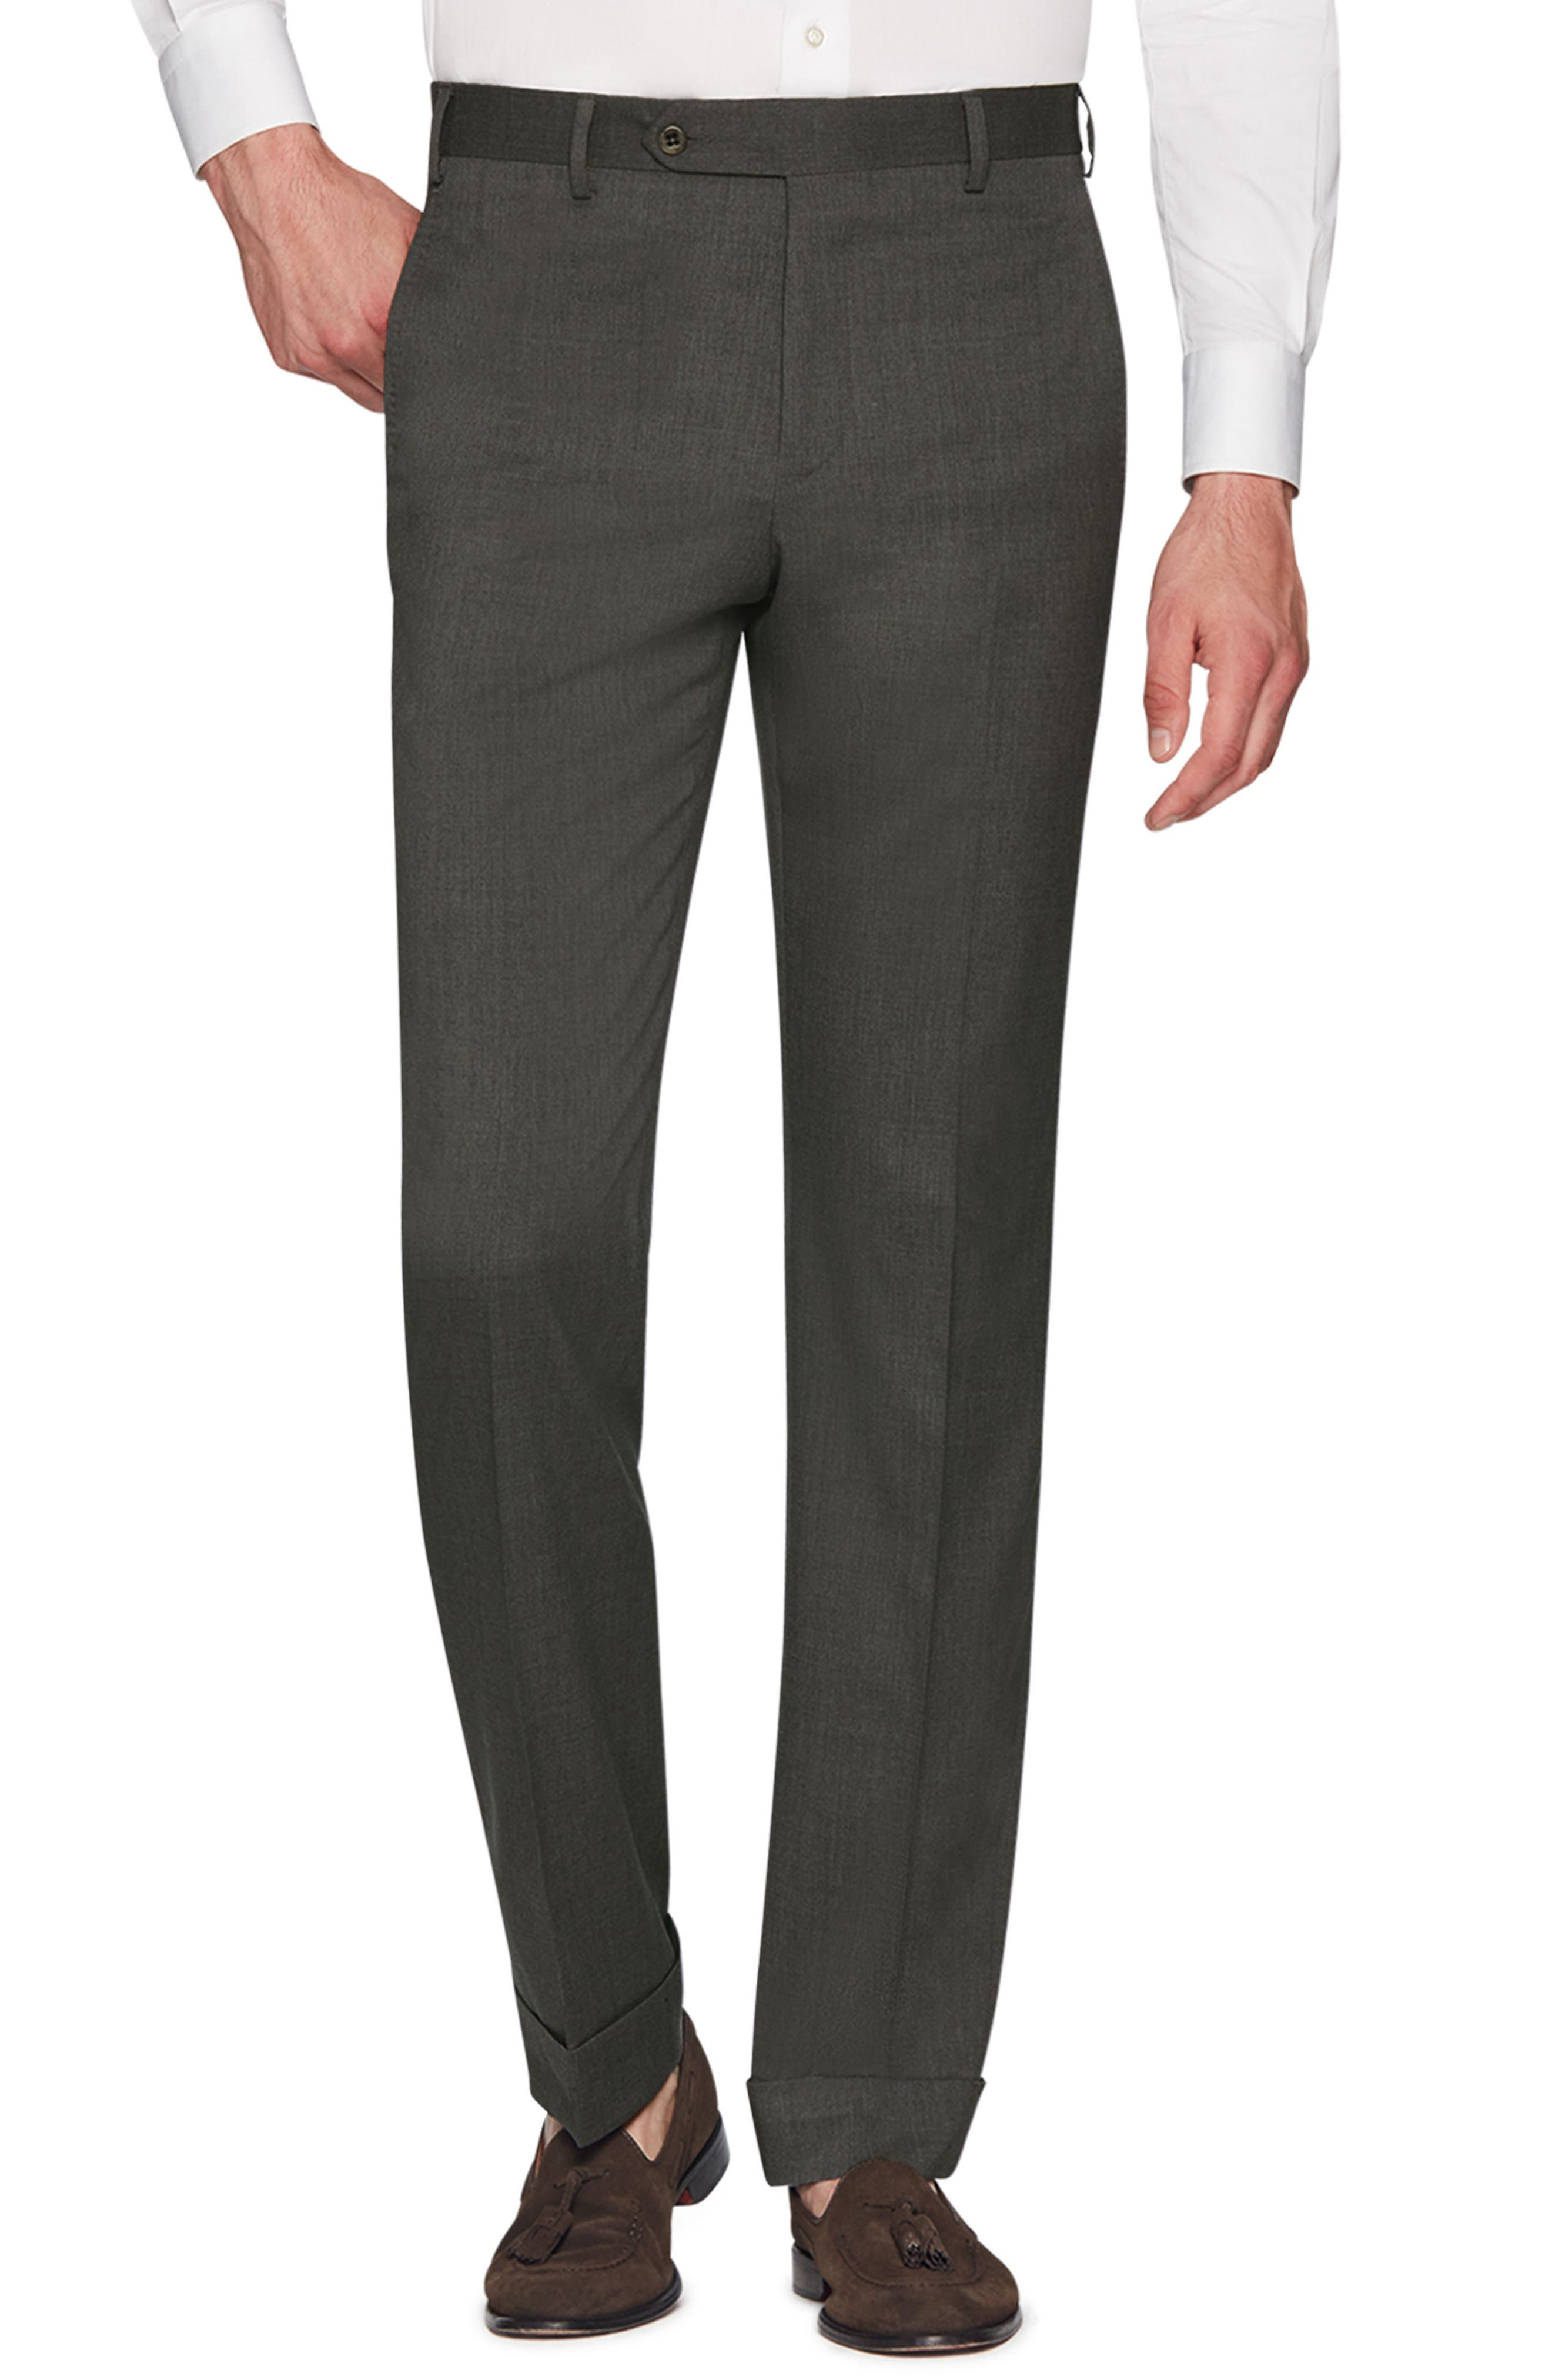 ZANELLA Devon Flat Front Stretch Solid Wool Trousers in Olive